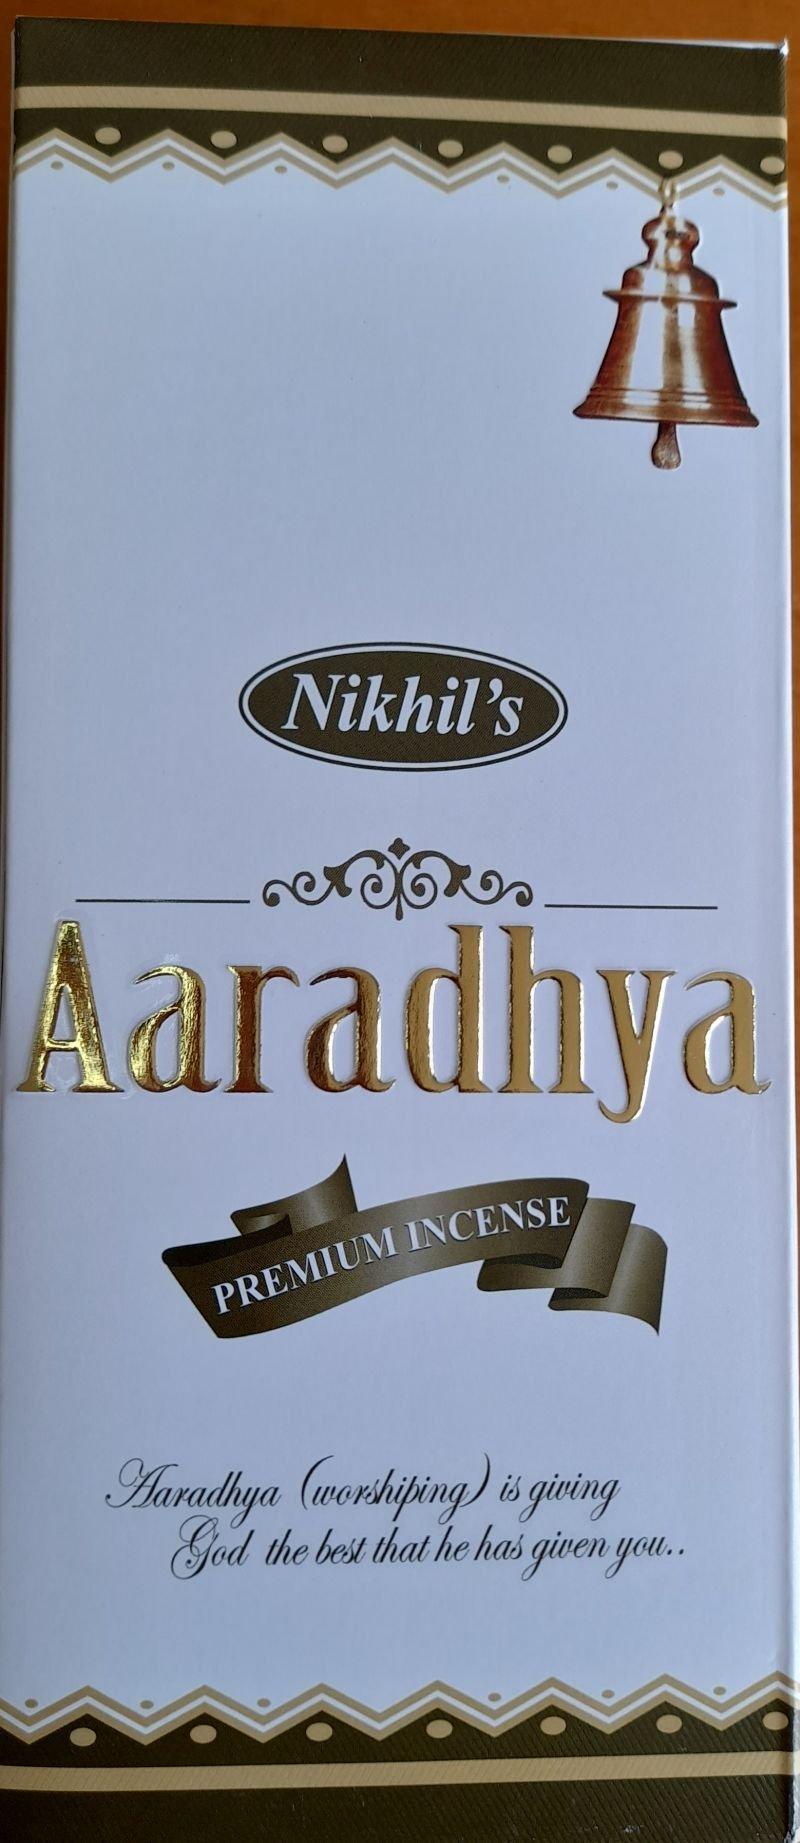 Nikhil Aaradhya 12 x 15g